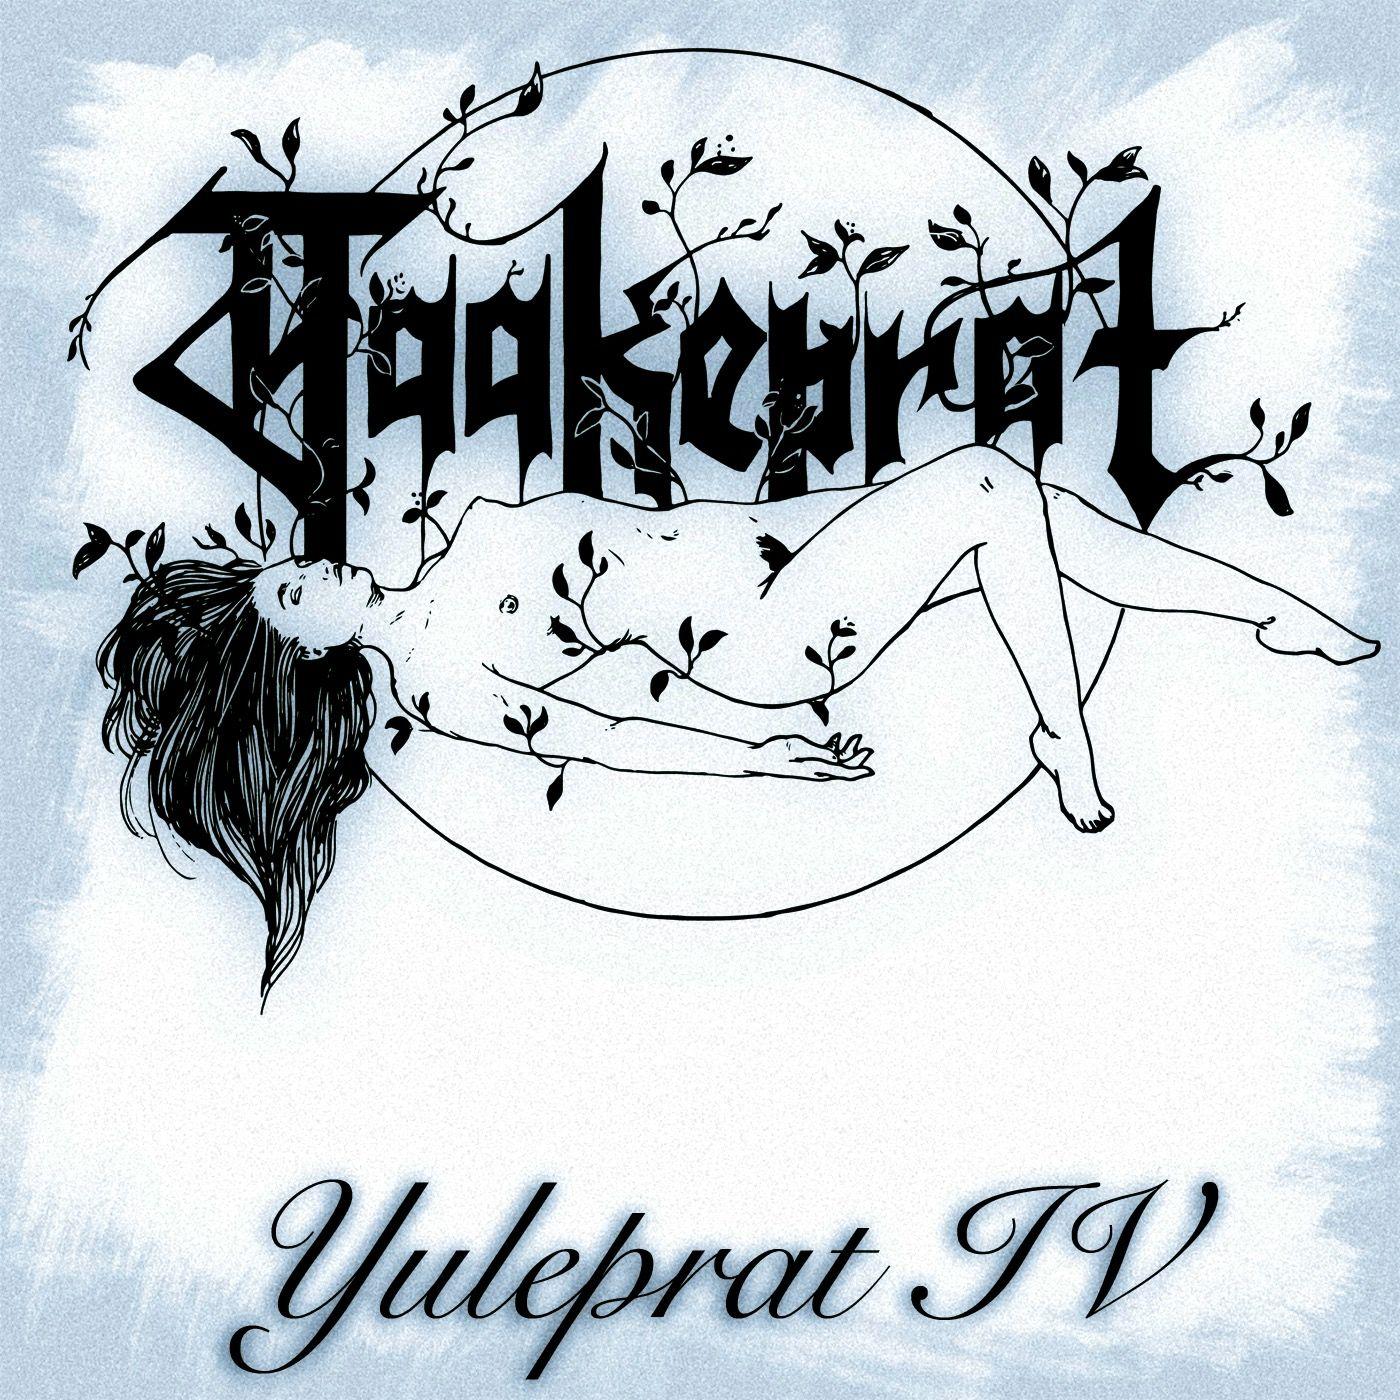 Episode 150 - Yuleprat IV